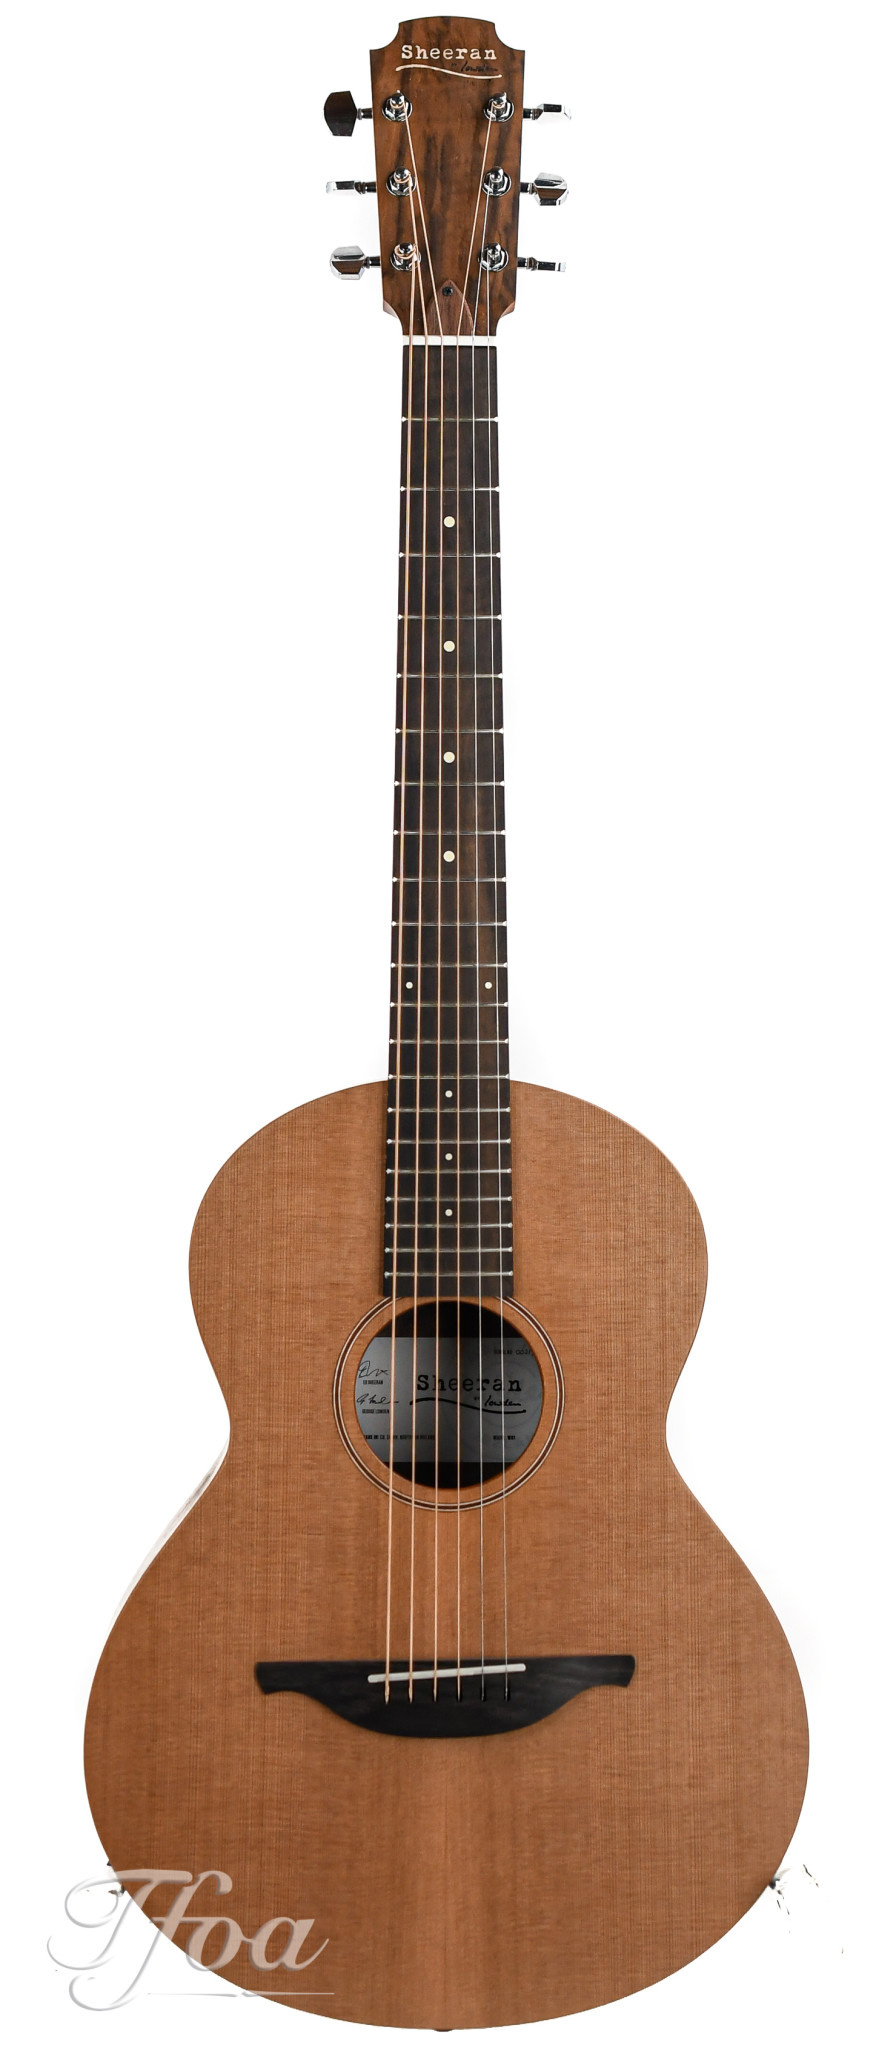 Sheeran W01 Walnut Cedar